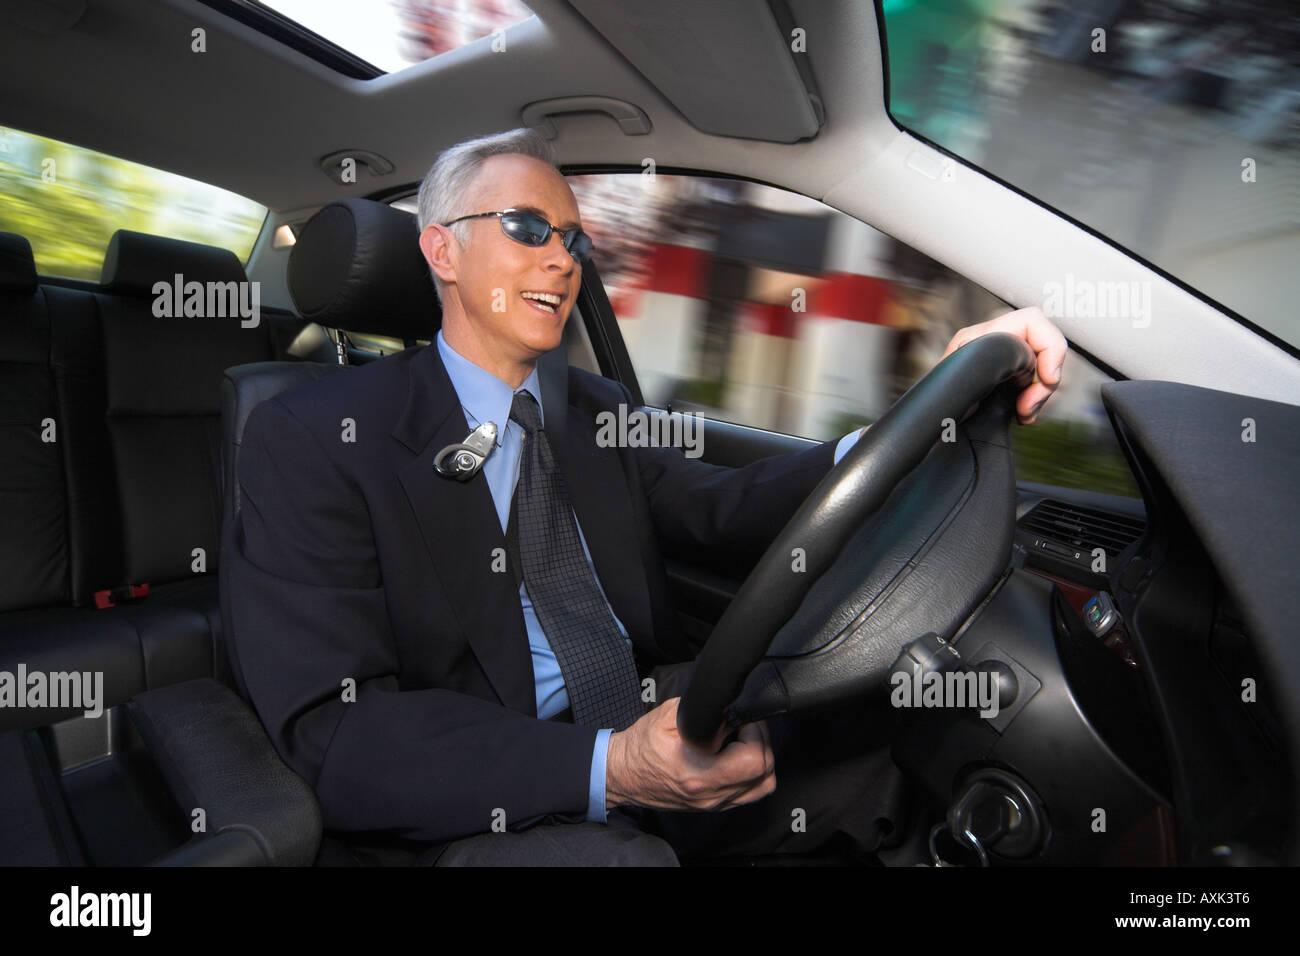 business work job career old elderly man sitting driving steering fast happy in new car holding wheel sunroof sunglasses - Stock Image